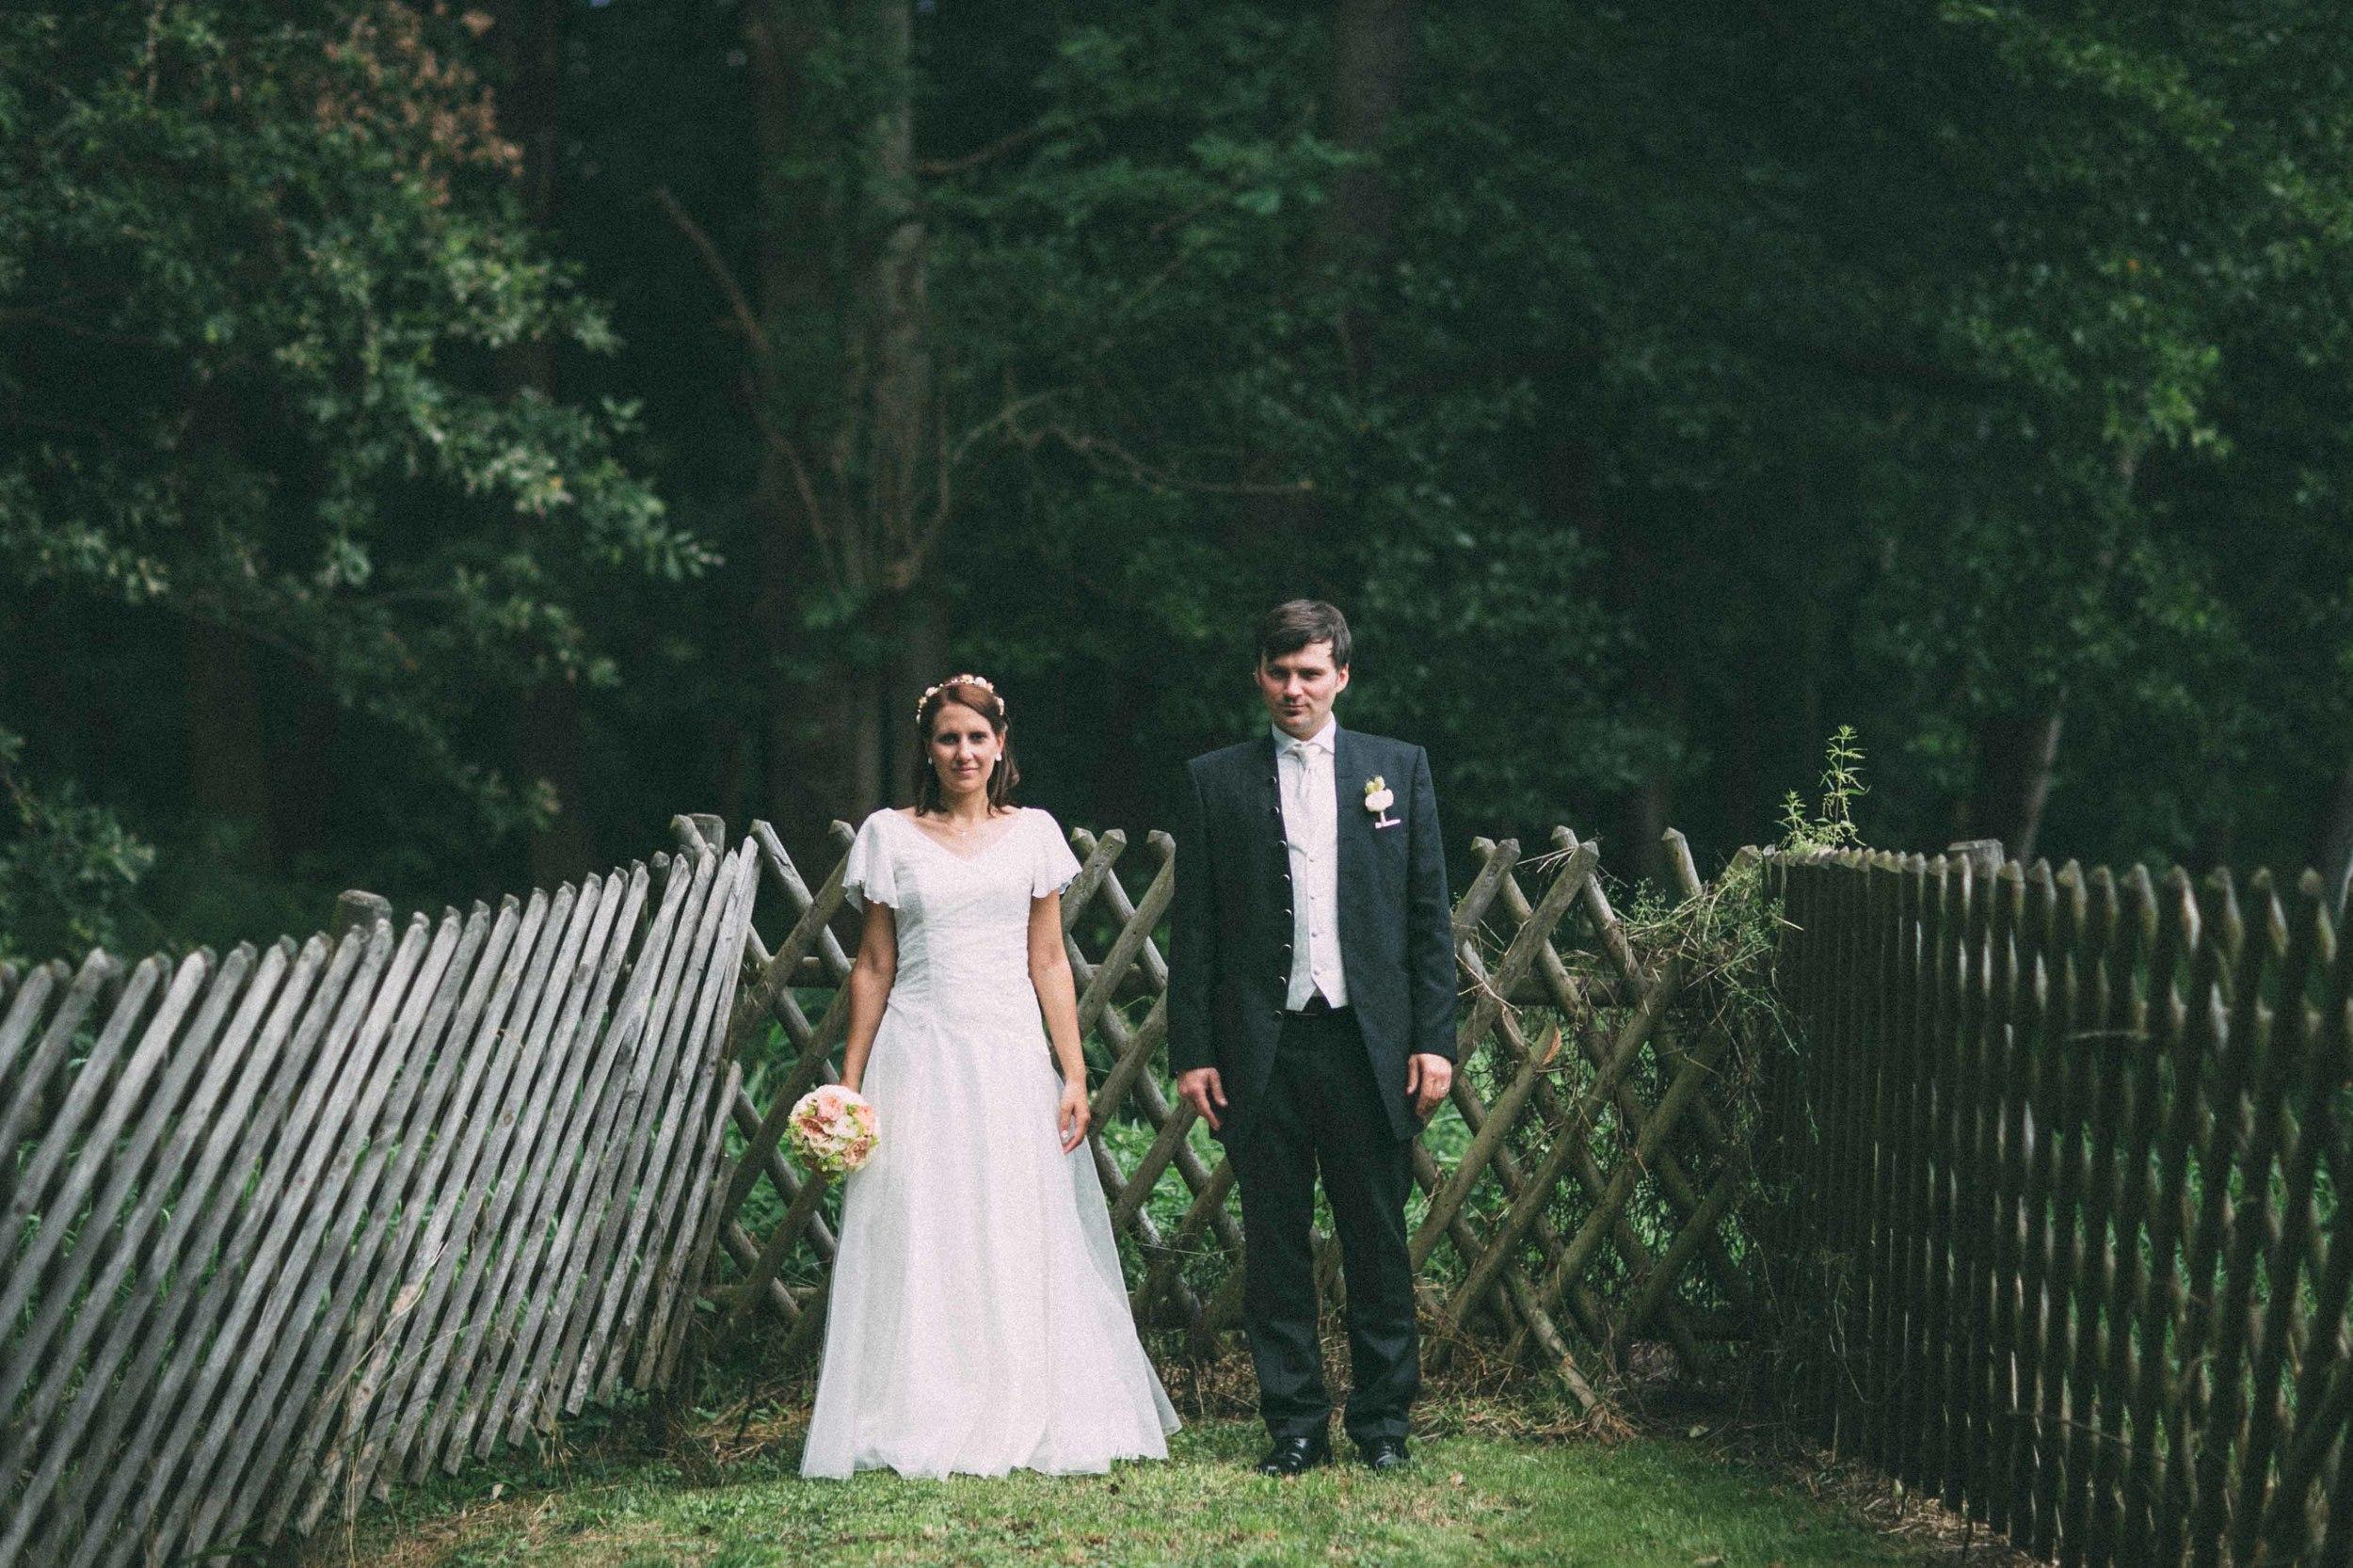 Spreewald Hochzeitsfotografie_Fran Burrows Fotografie-58.jpg